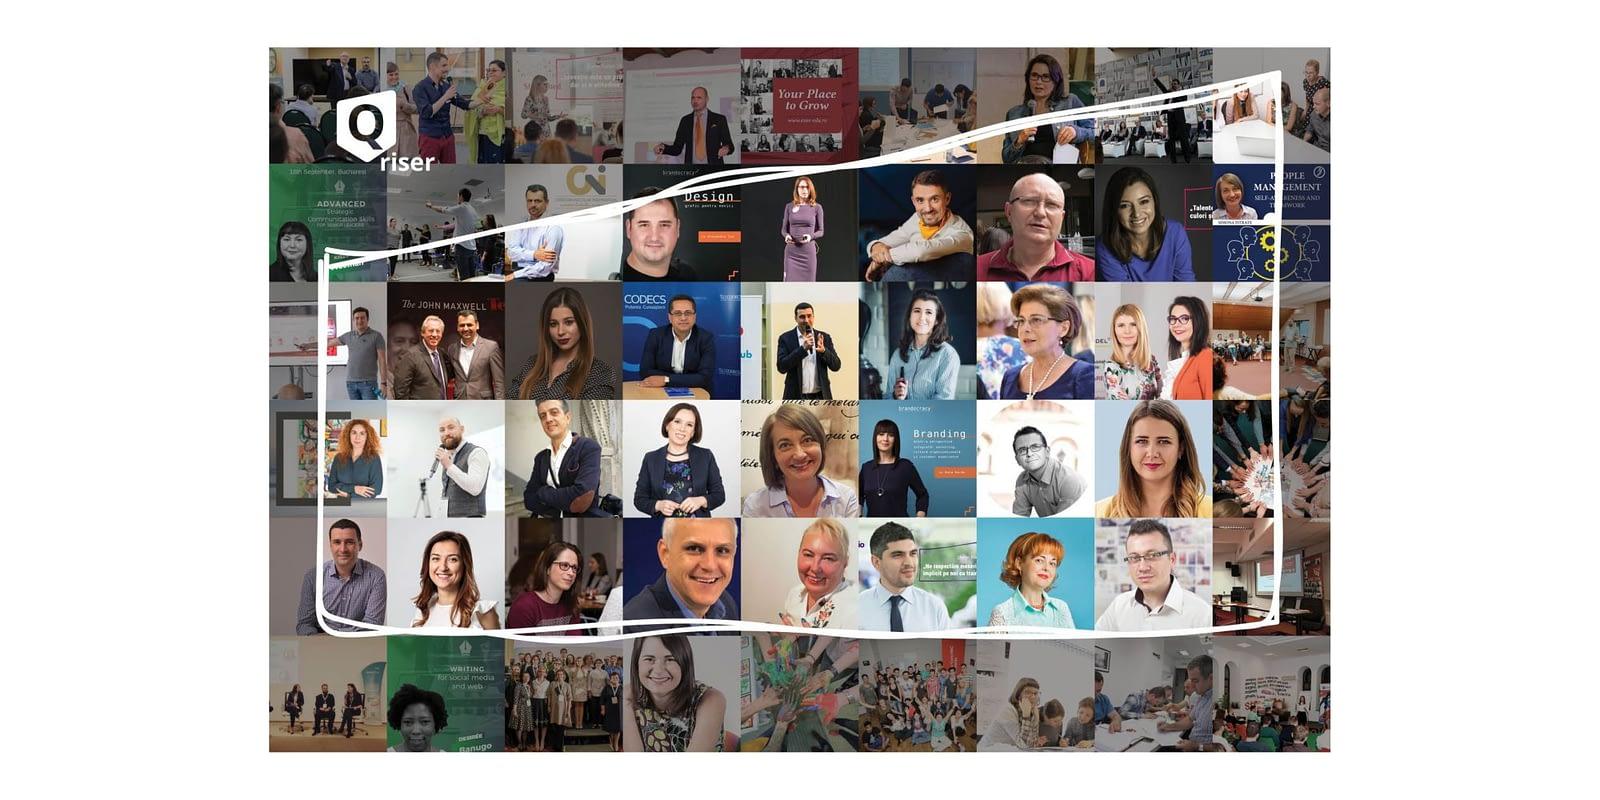 Style Guide Qriser 2020, learning, training, cursuri, formare continua, curs, coach, Toud